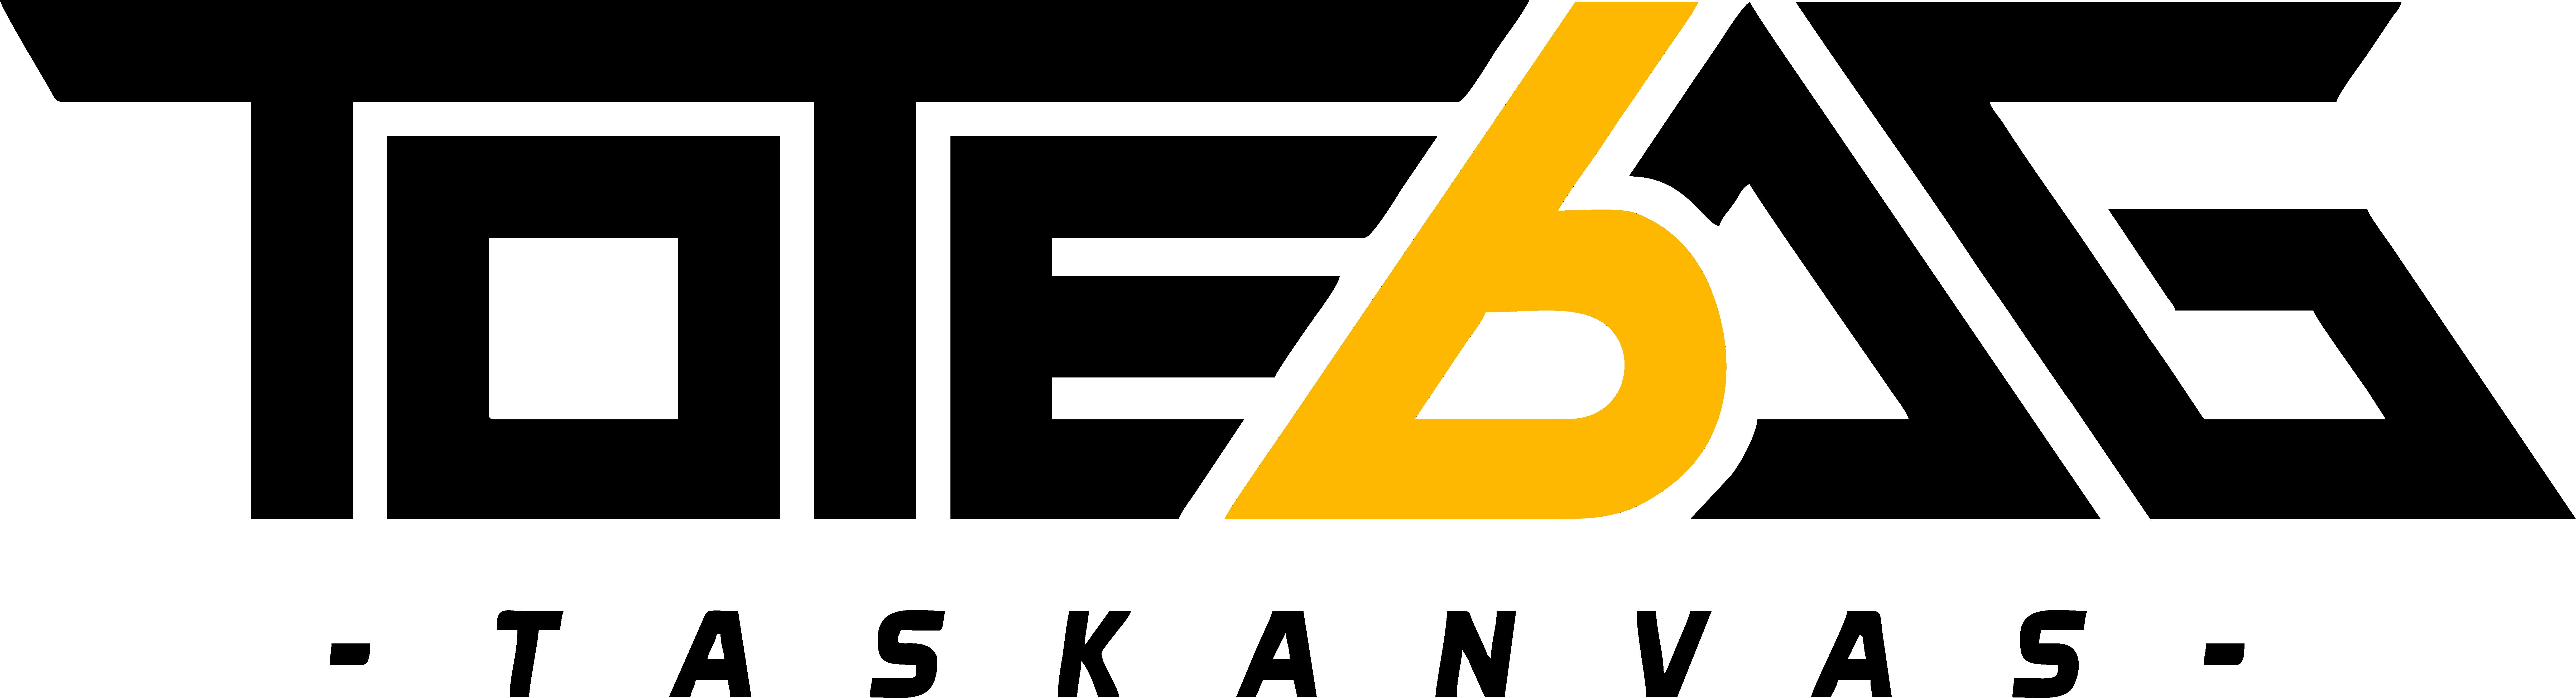 totebag tas kanvas logo